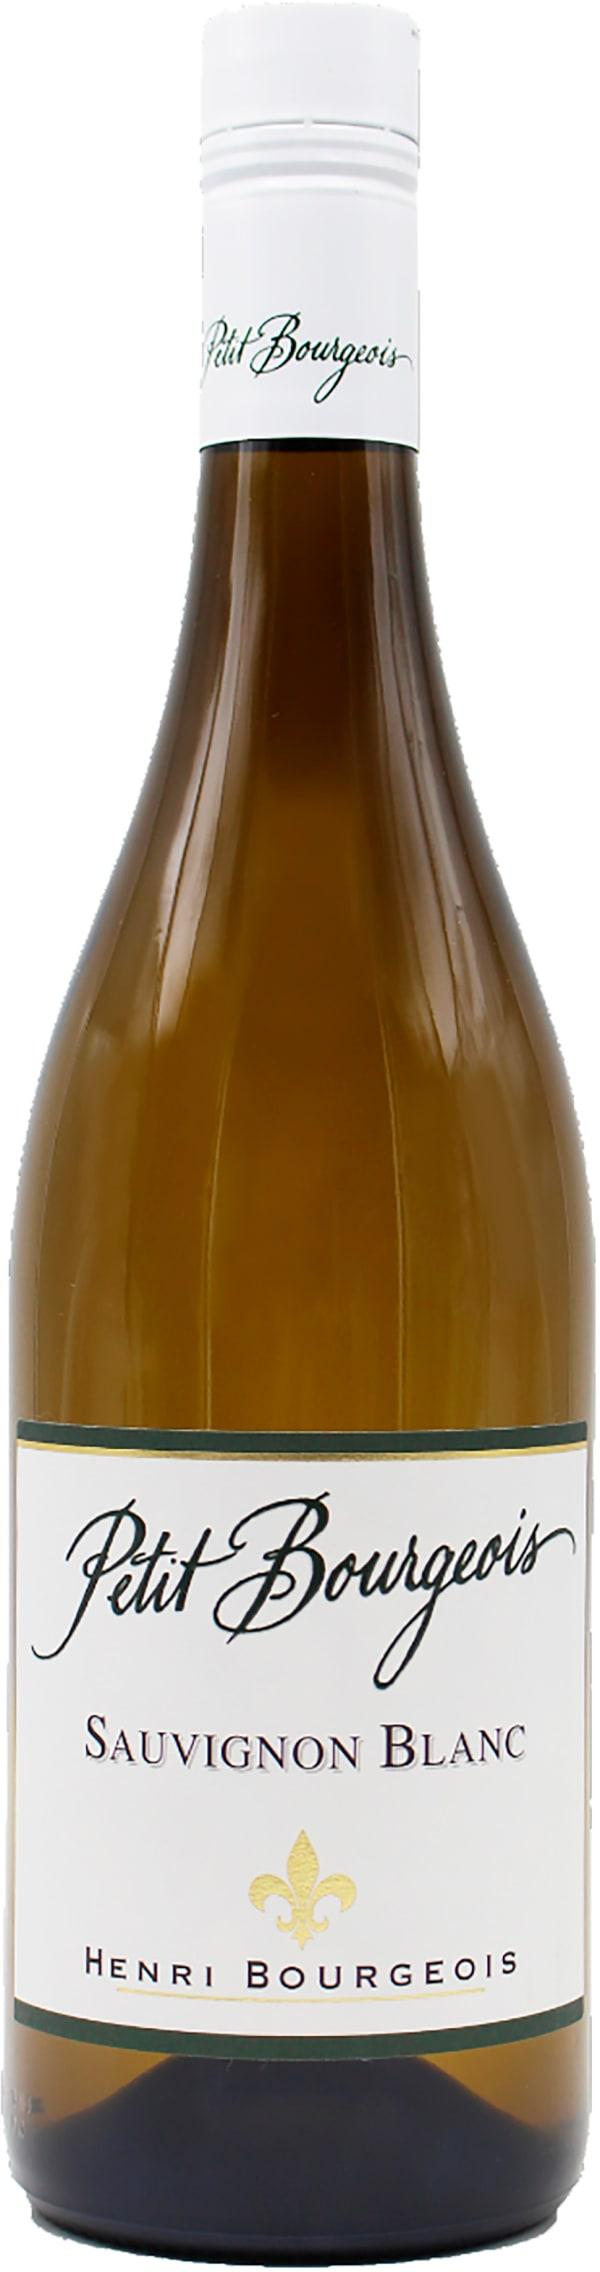 Petit Bourgeois Sauvignon Blanc 2019